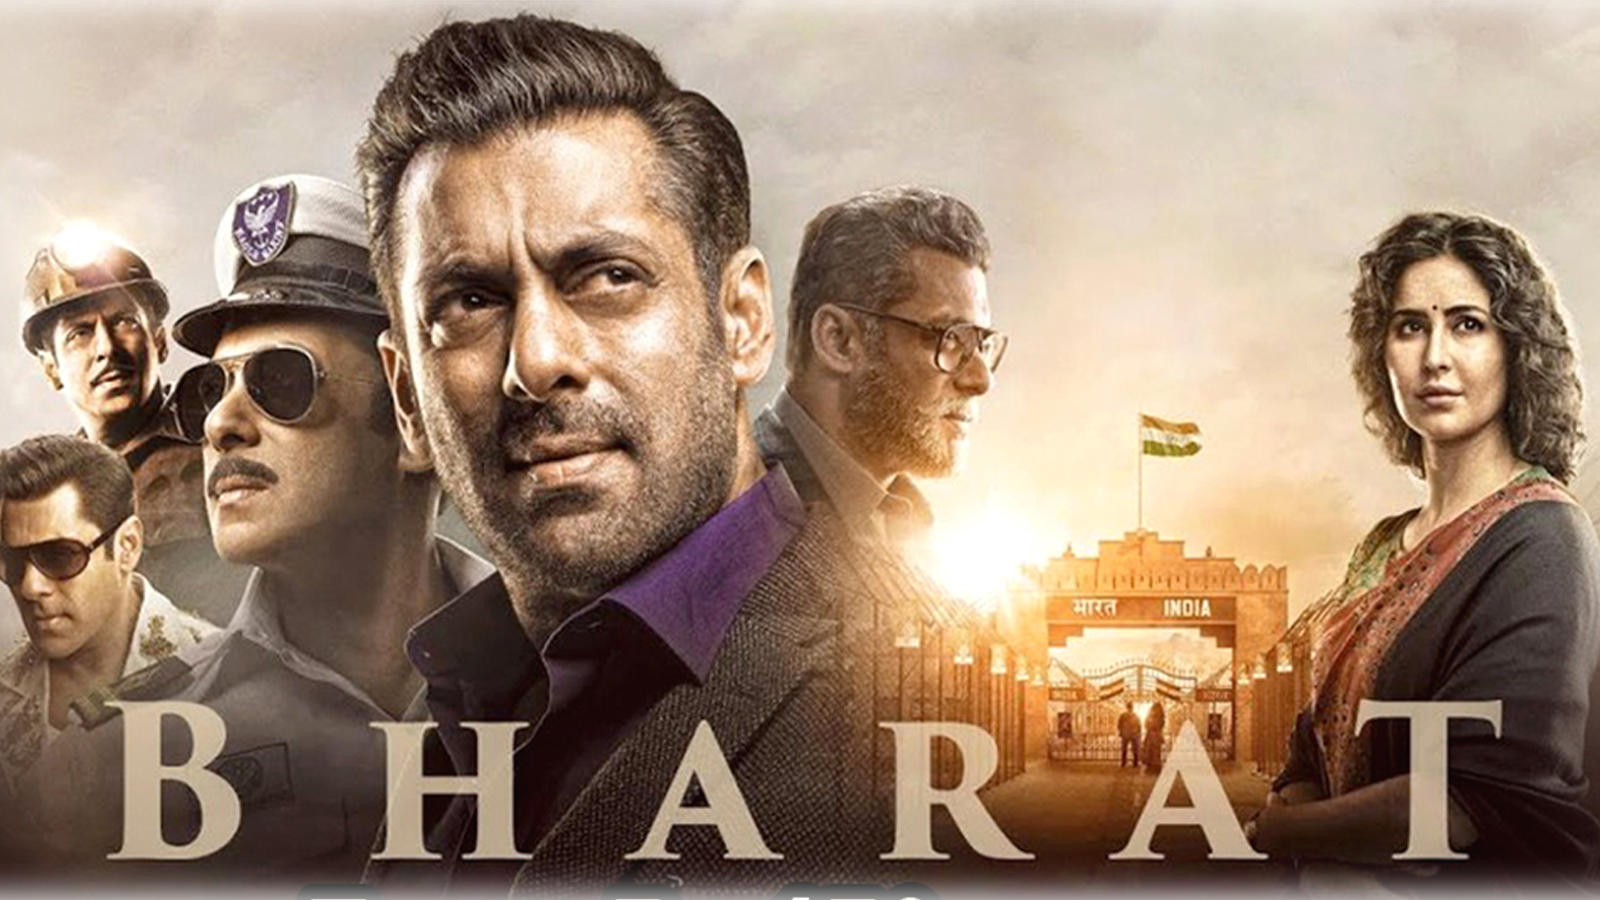 'Bharat' box office collection: Despite ICC Cricket World Cup 2019, Salman Khan and Katrina Kaif starrer movie crosses 150 mark